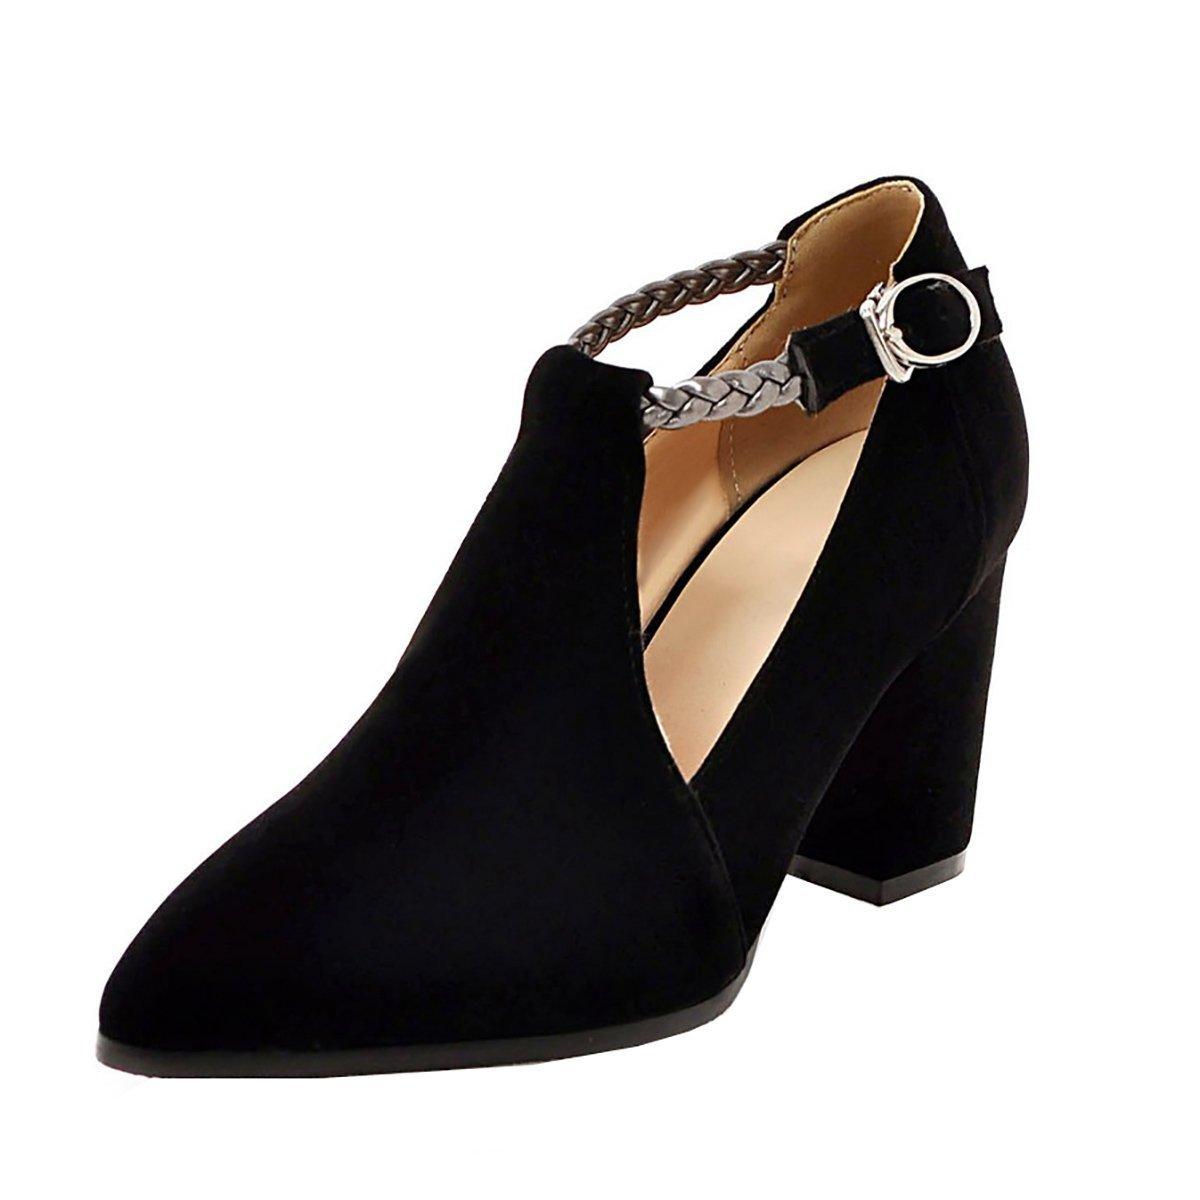 fd5abf0f9ec531 YE Damen T Strap Pumps Blockabsatz High Heels mit Riemchen Bequem Elegant  Schuhe 38 EU